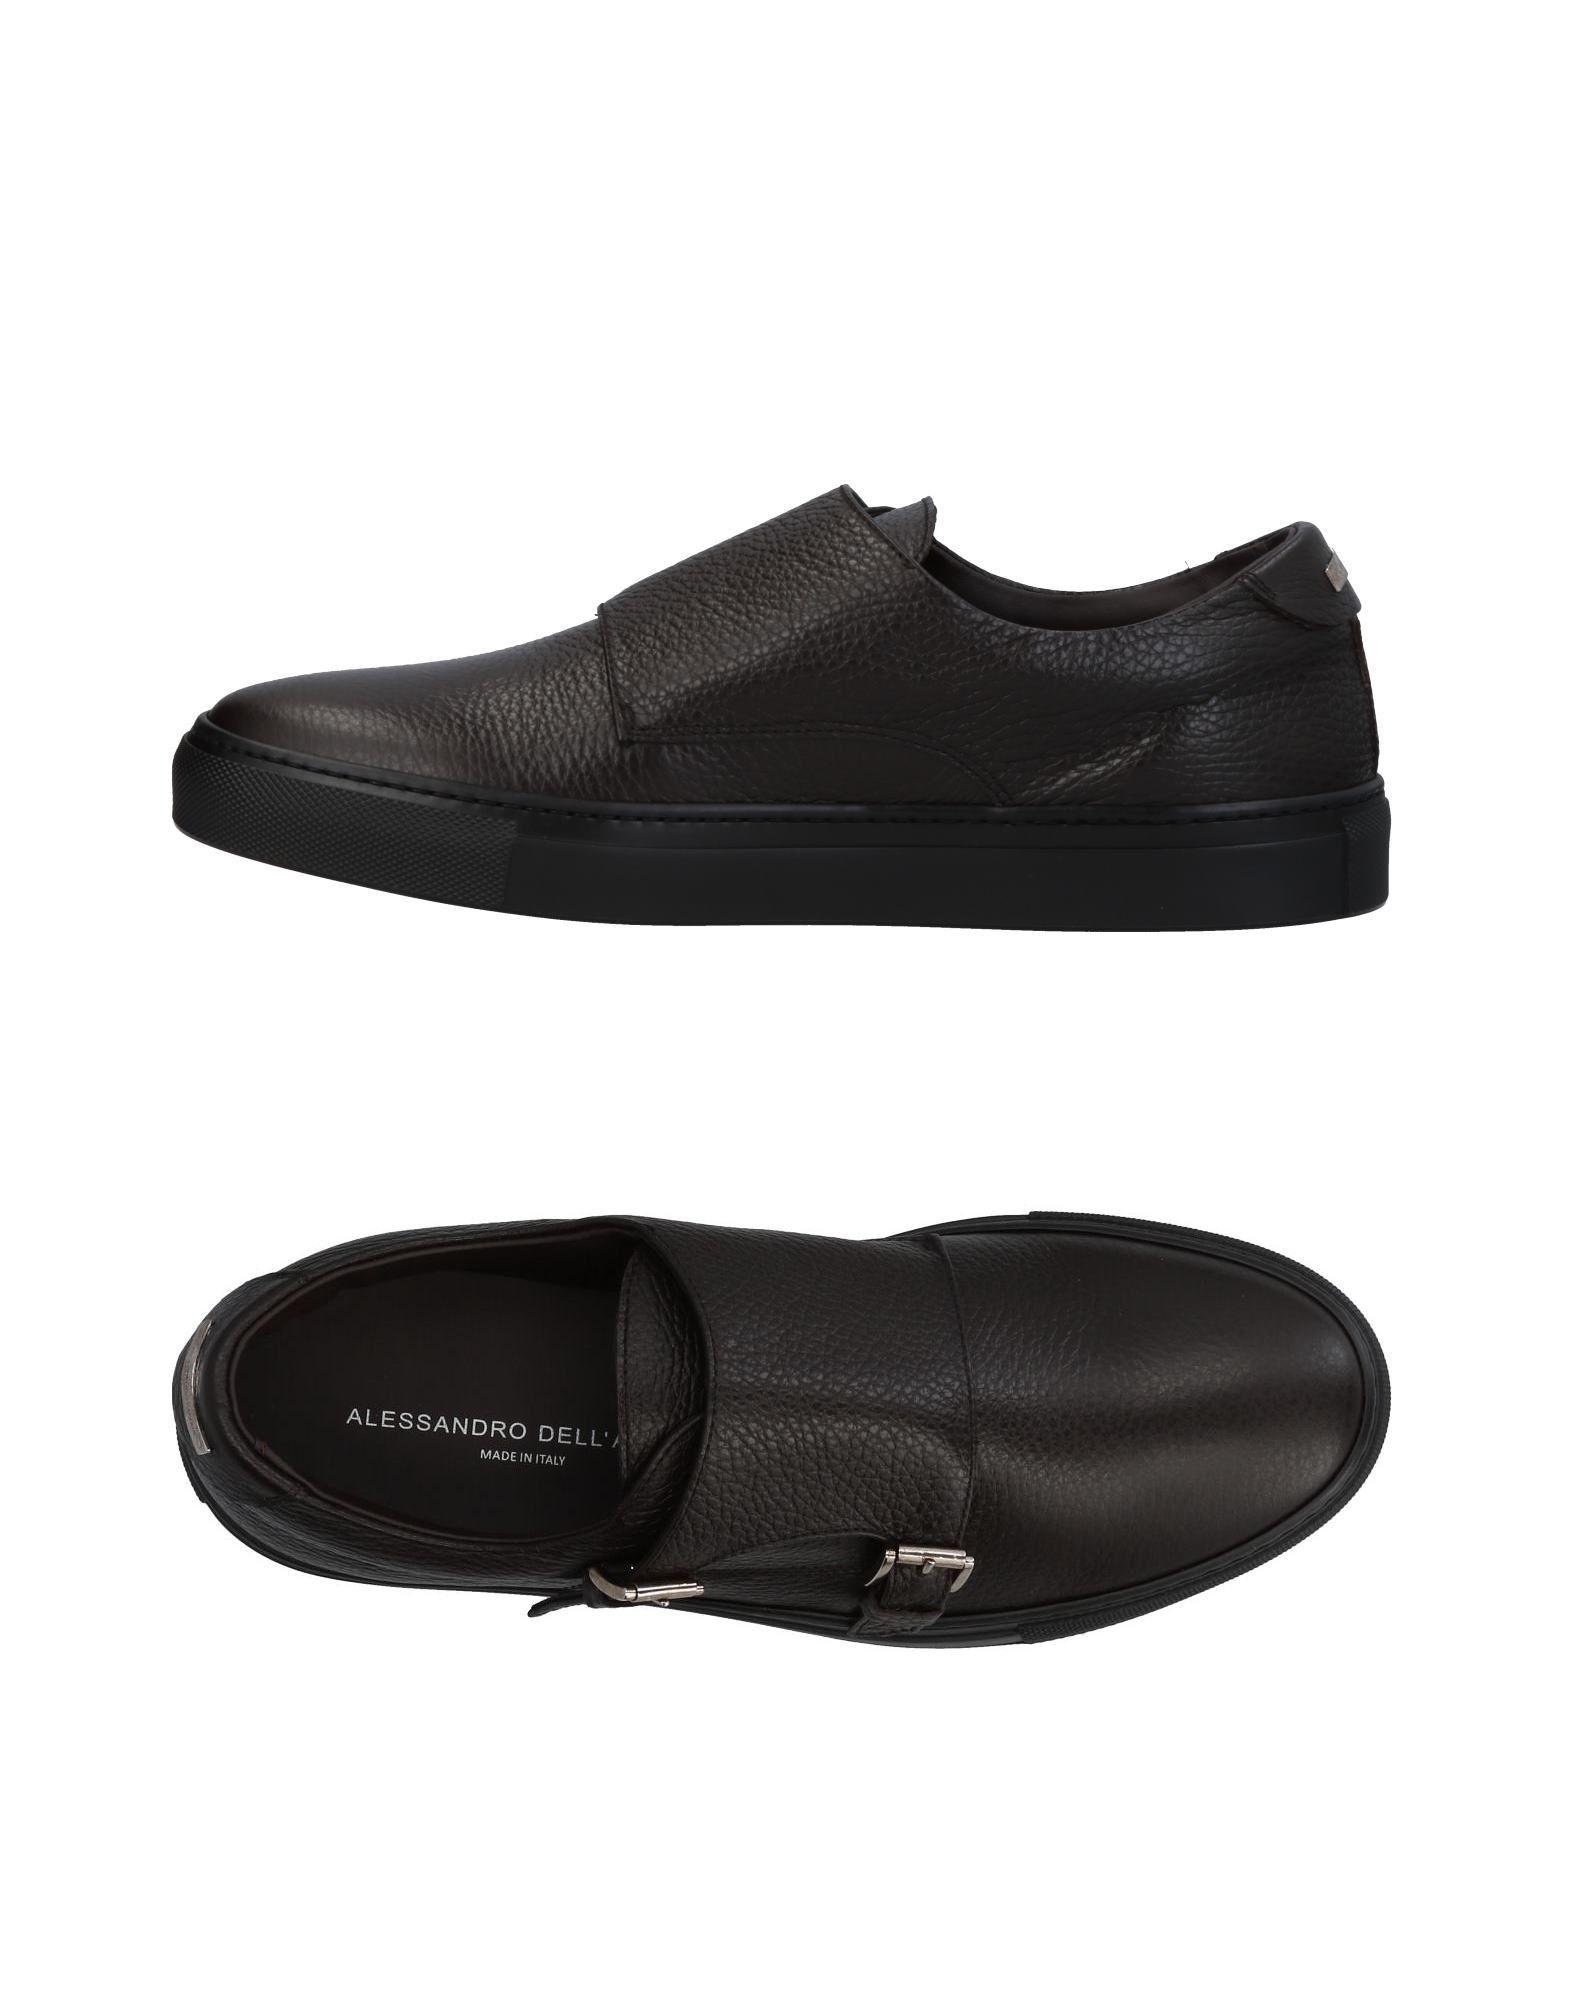 Alessandro Dell'acqua Sneakers Herren  11428115UJ Gute Qualität beliebte Schuhe